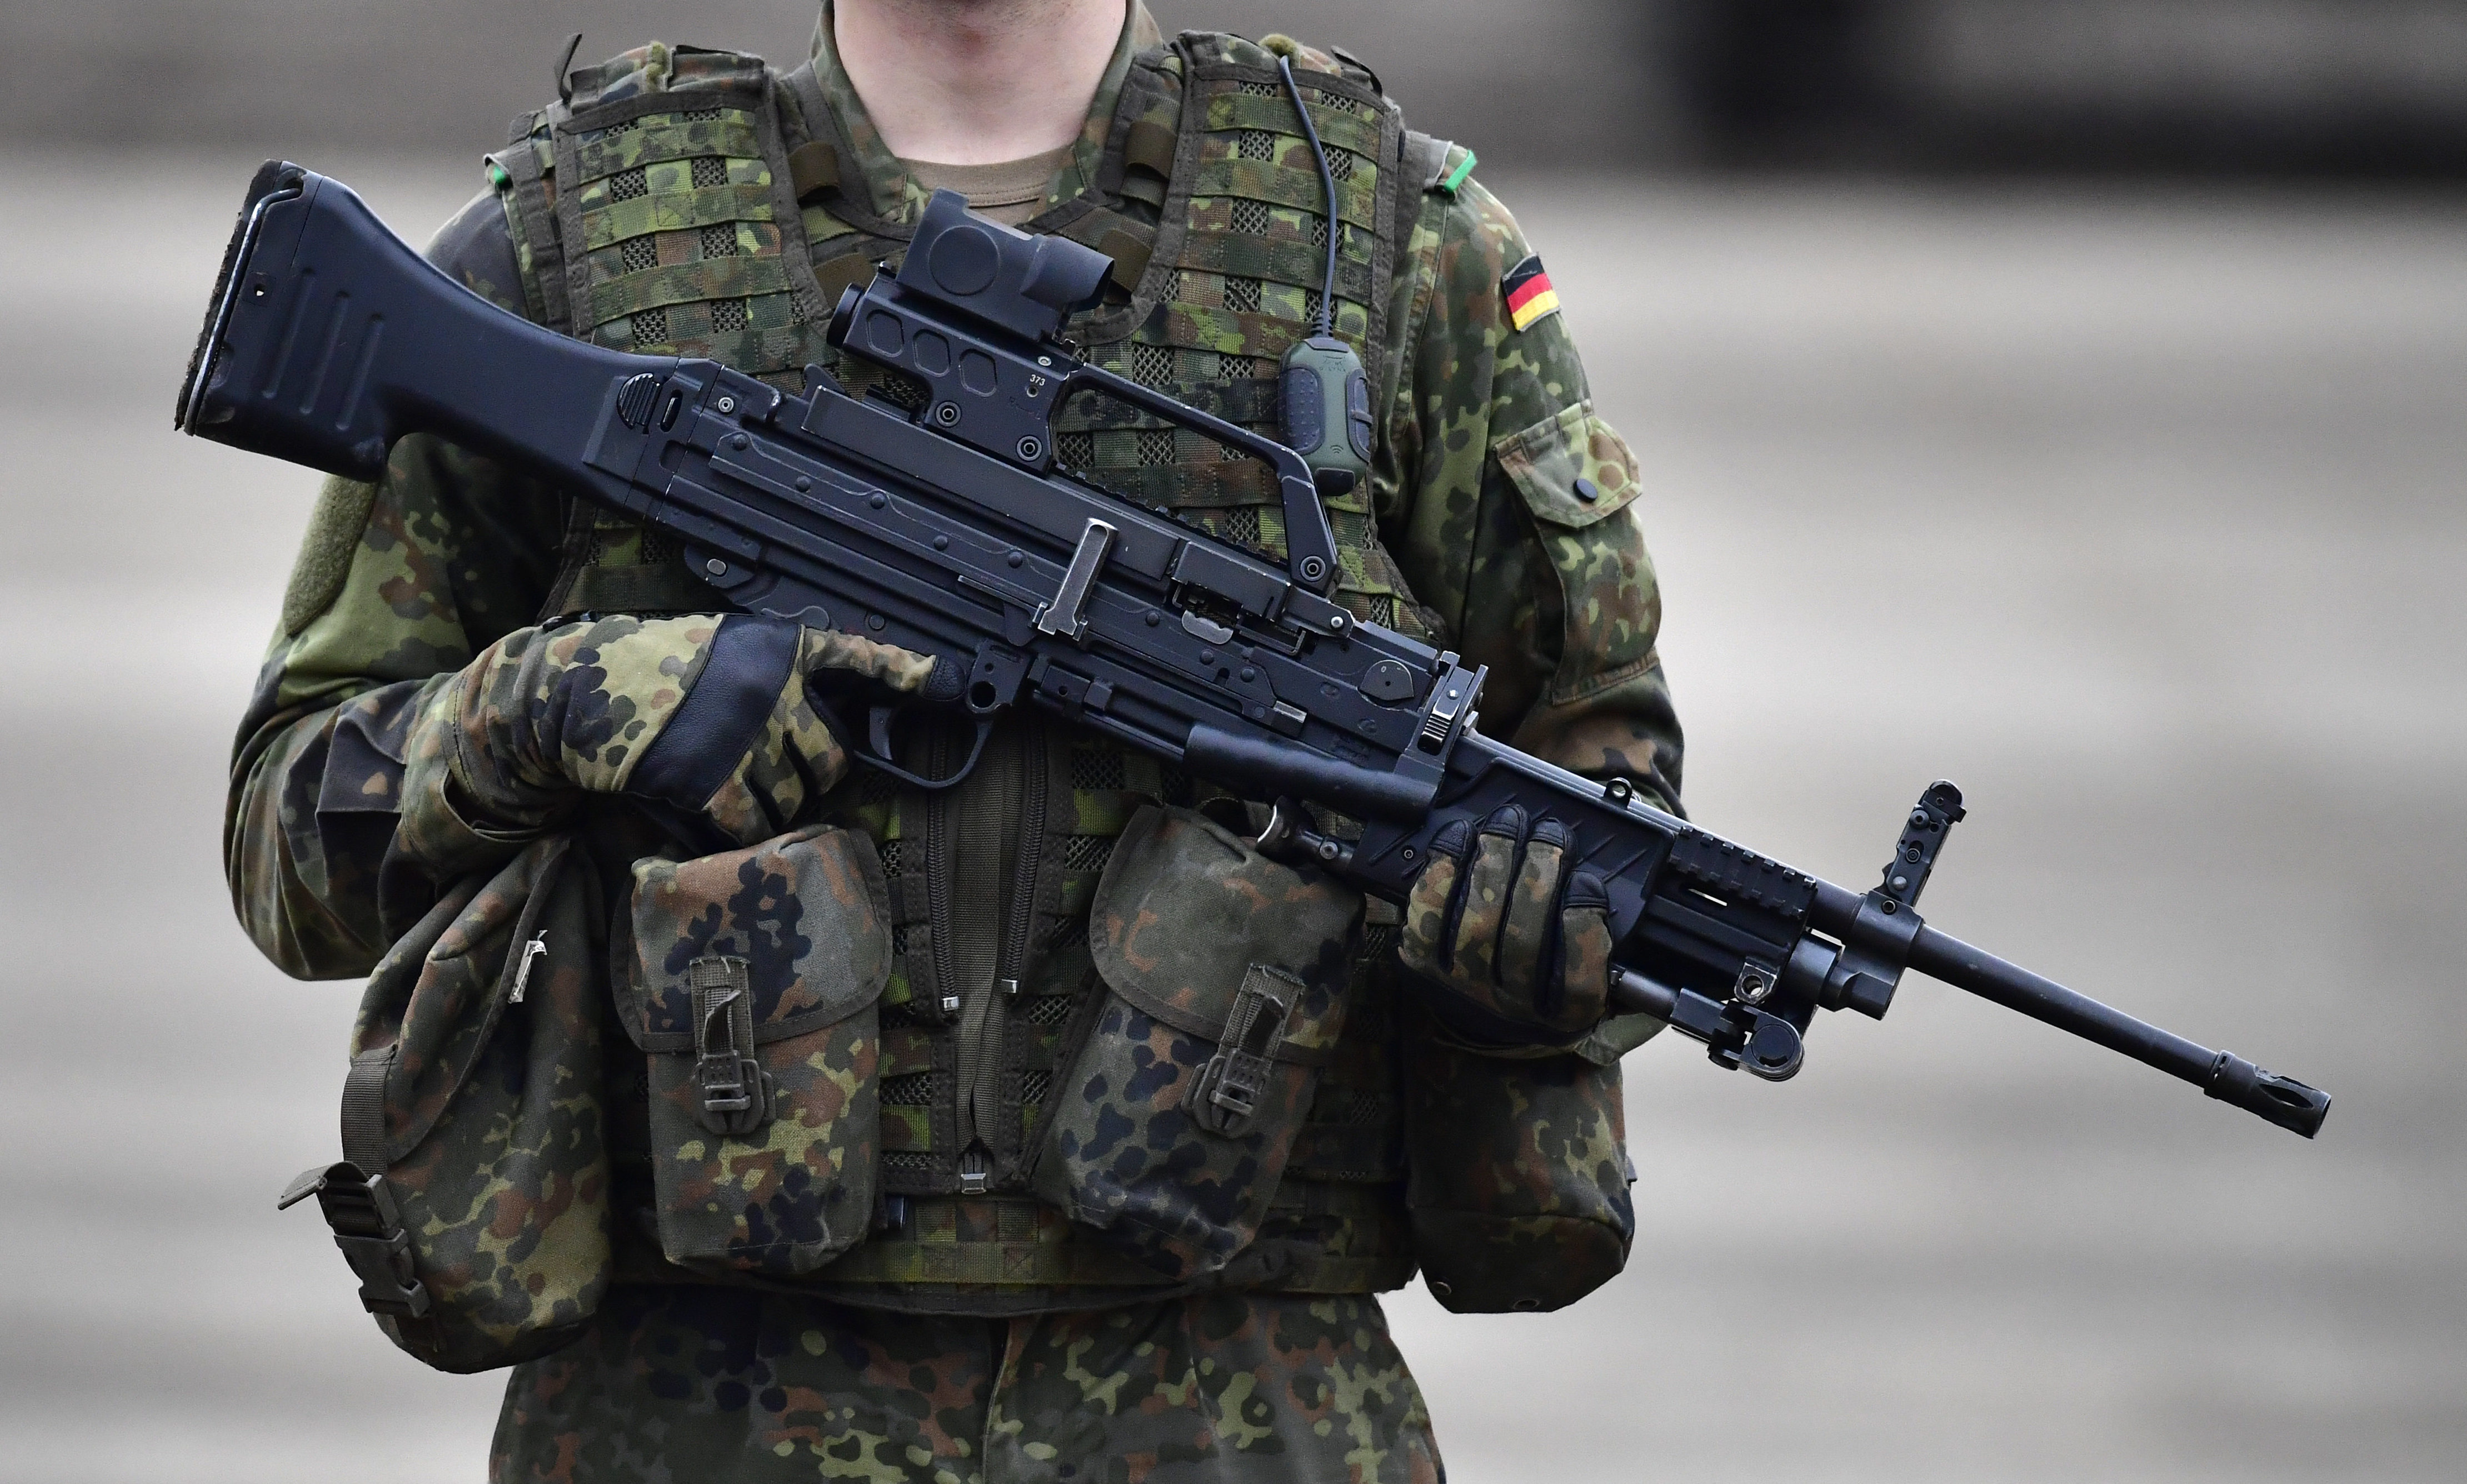 Franco A. hortete 1.000 Schuss Munition